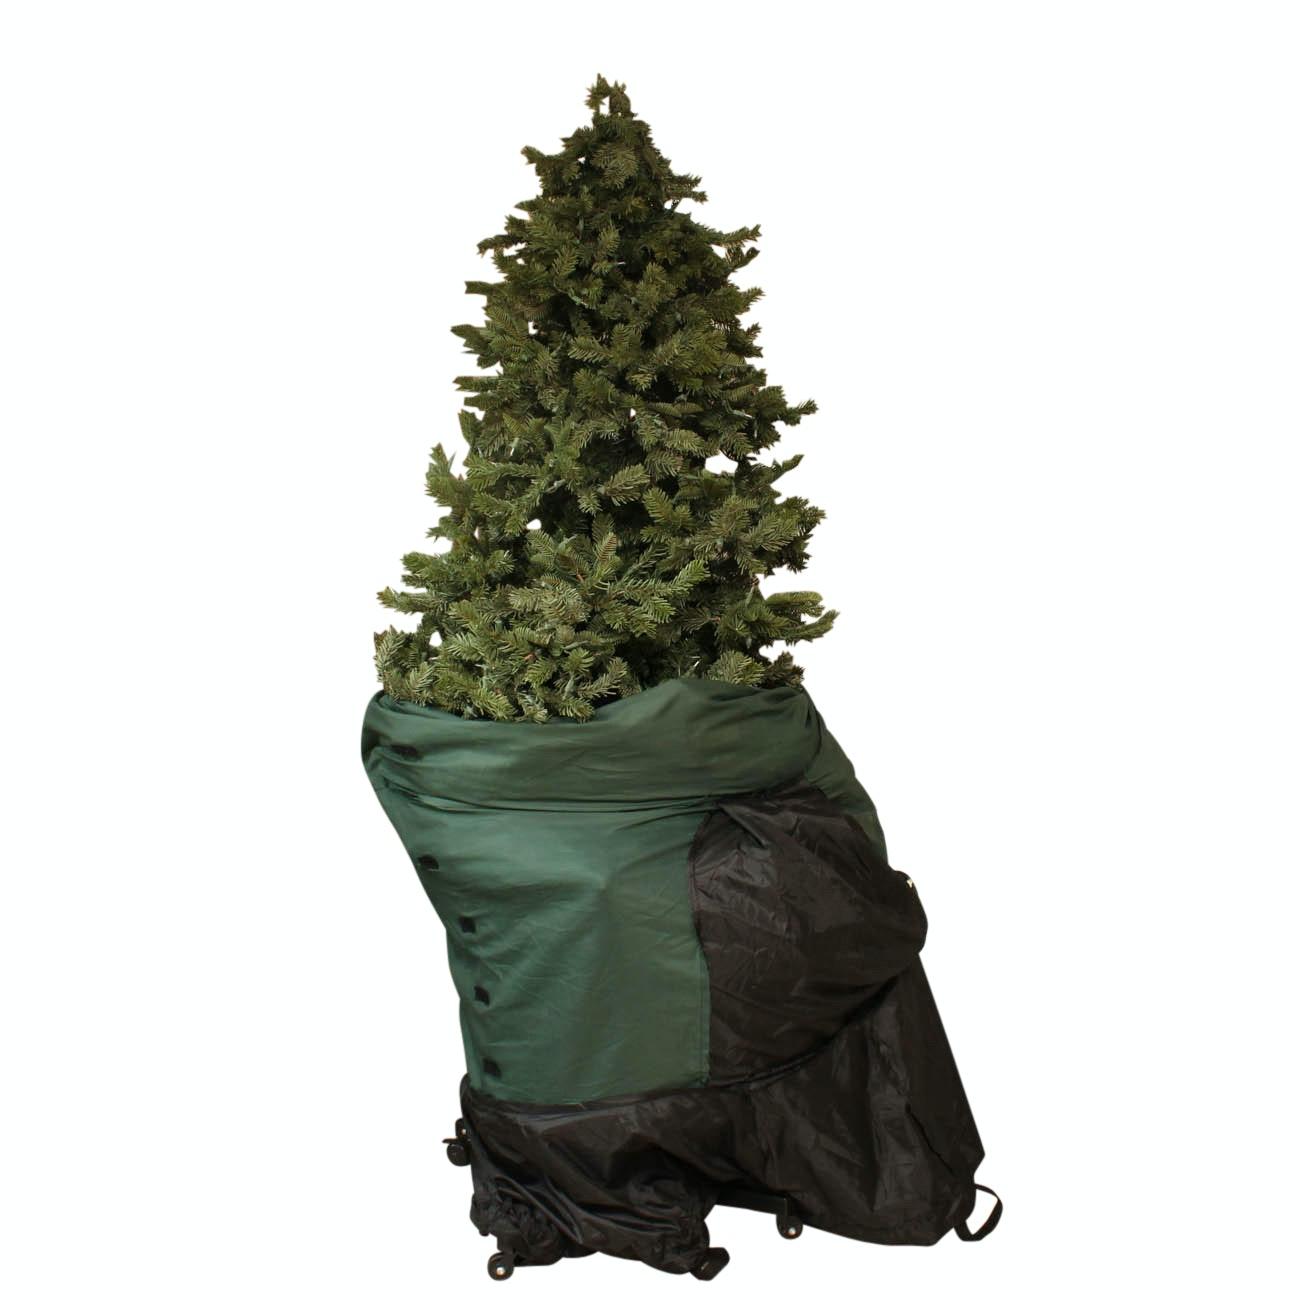 Frontgate Pre-Lit Artificial Christmas Tree